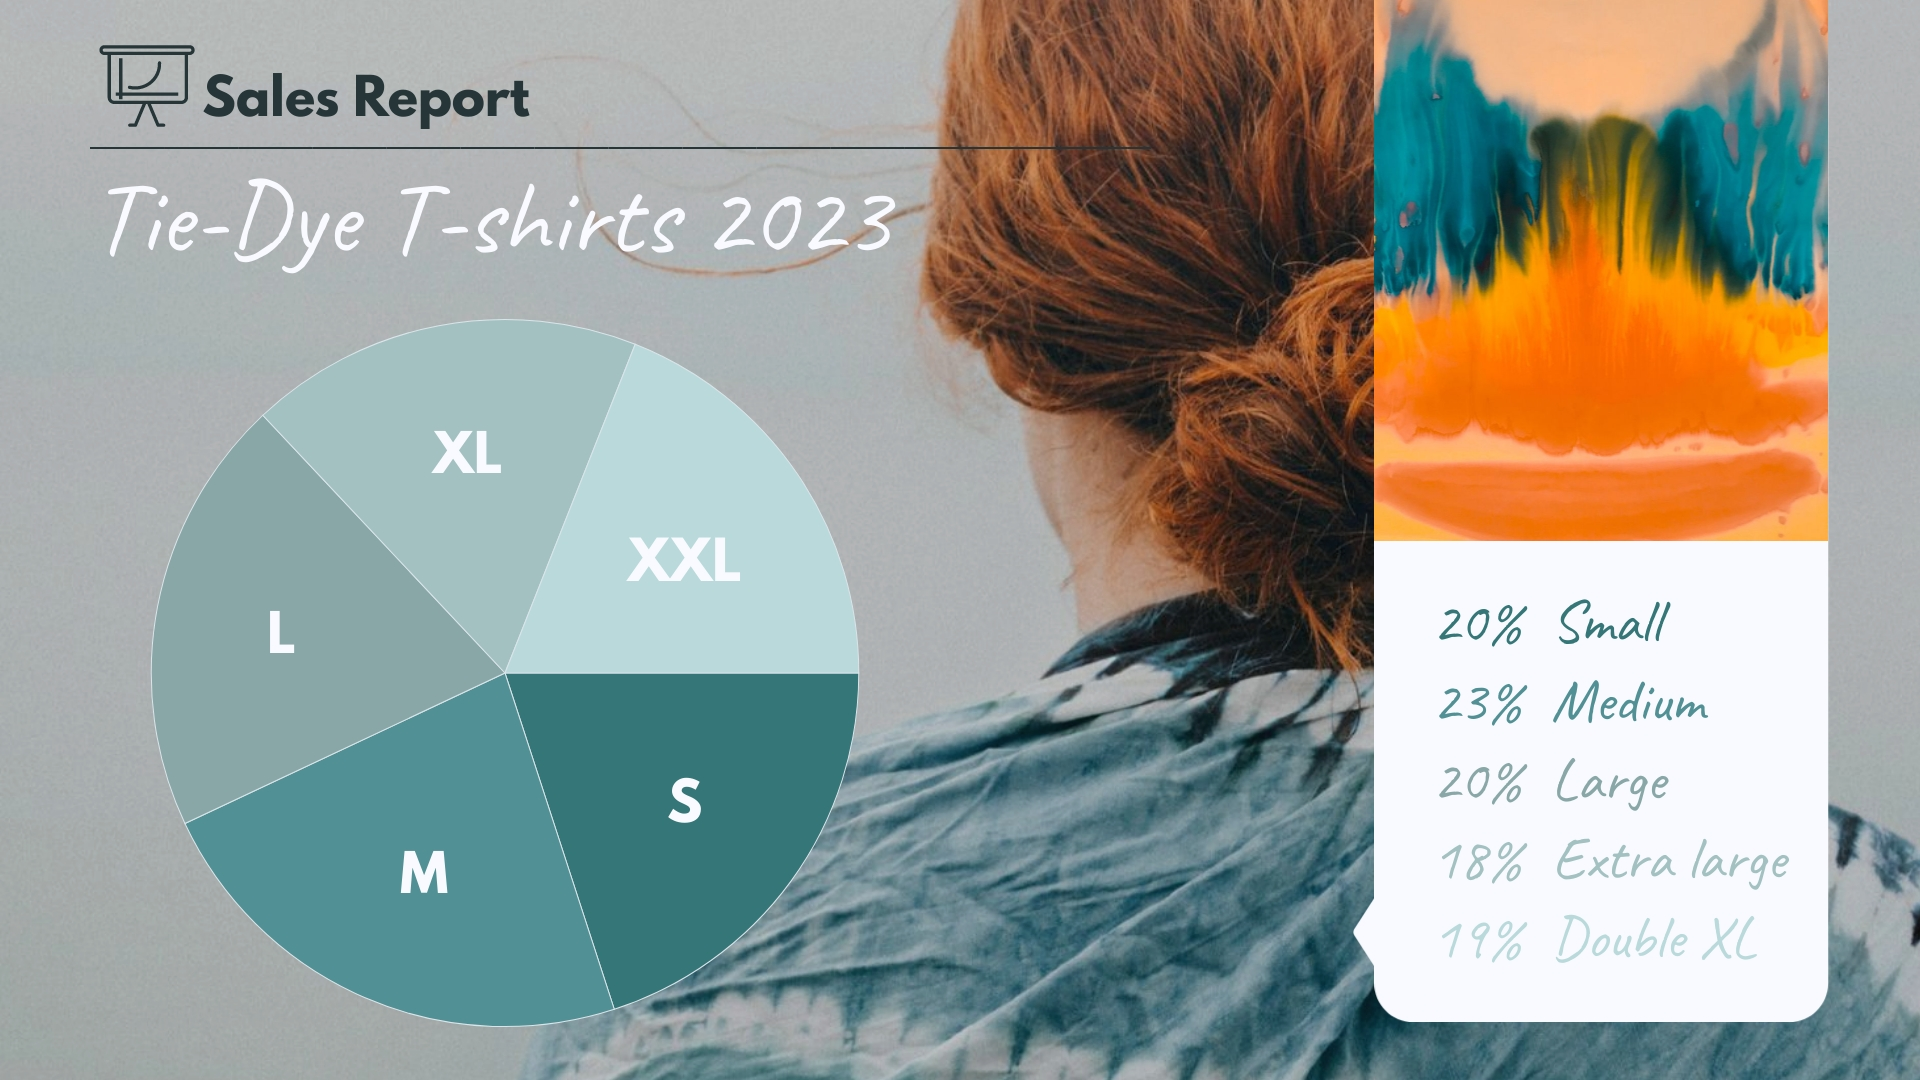 TShirt Sales Pie Chart Template